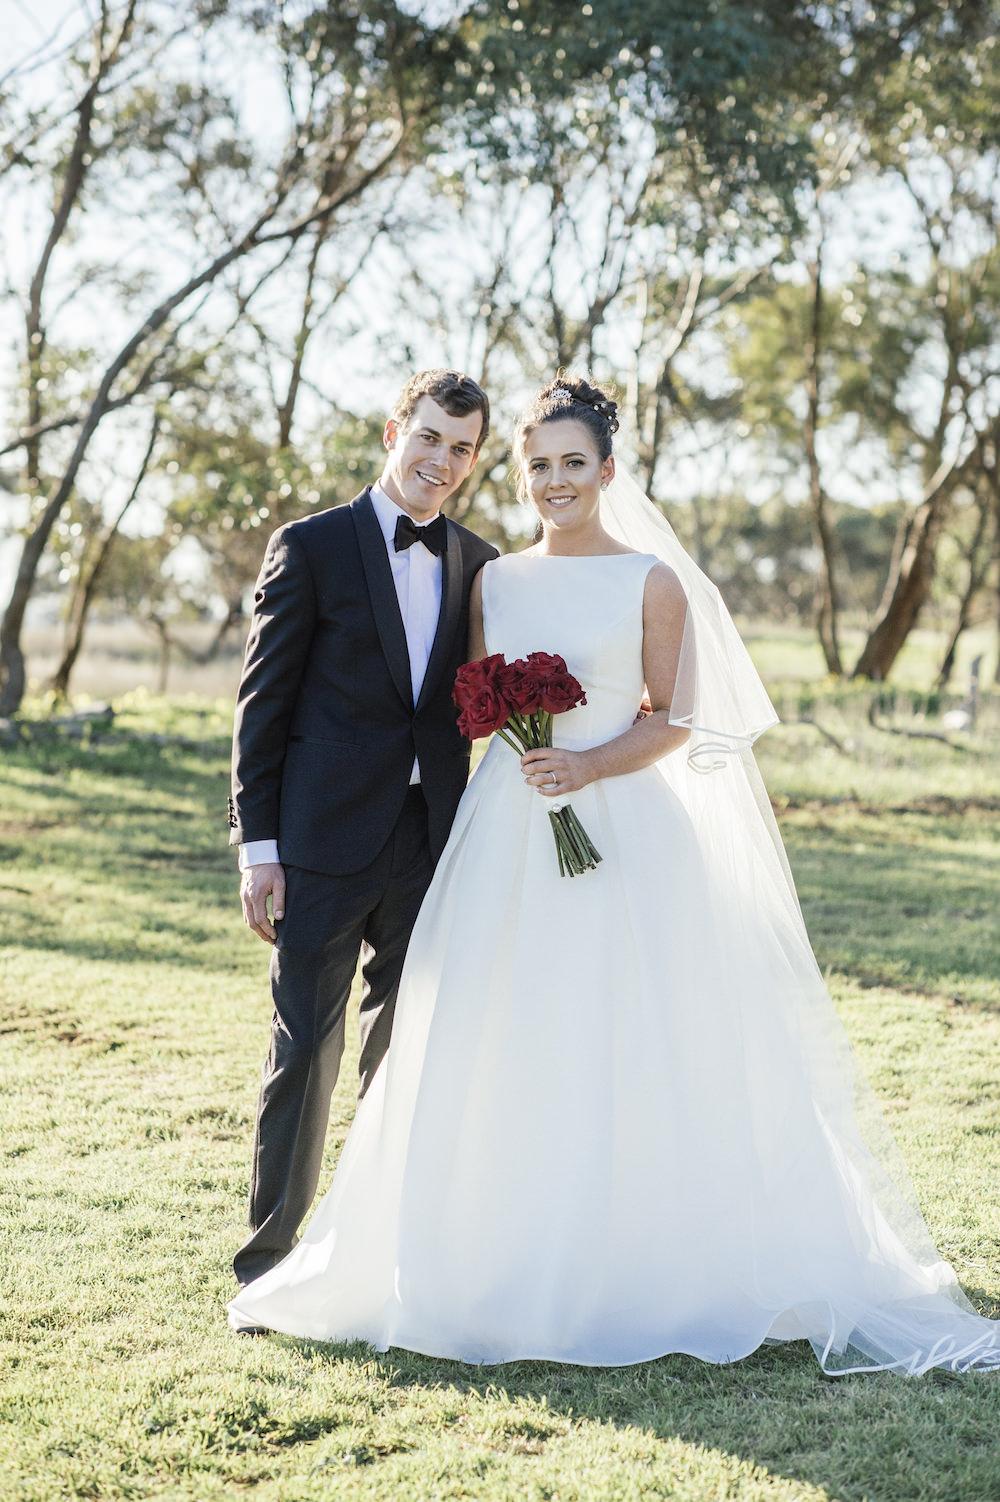 lindahamish-wedding-342.JPG